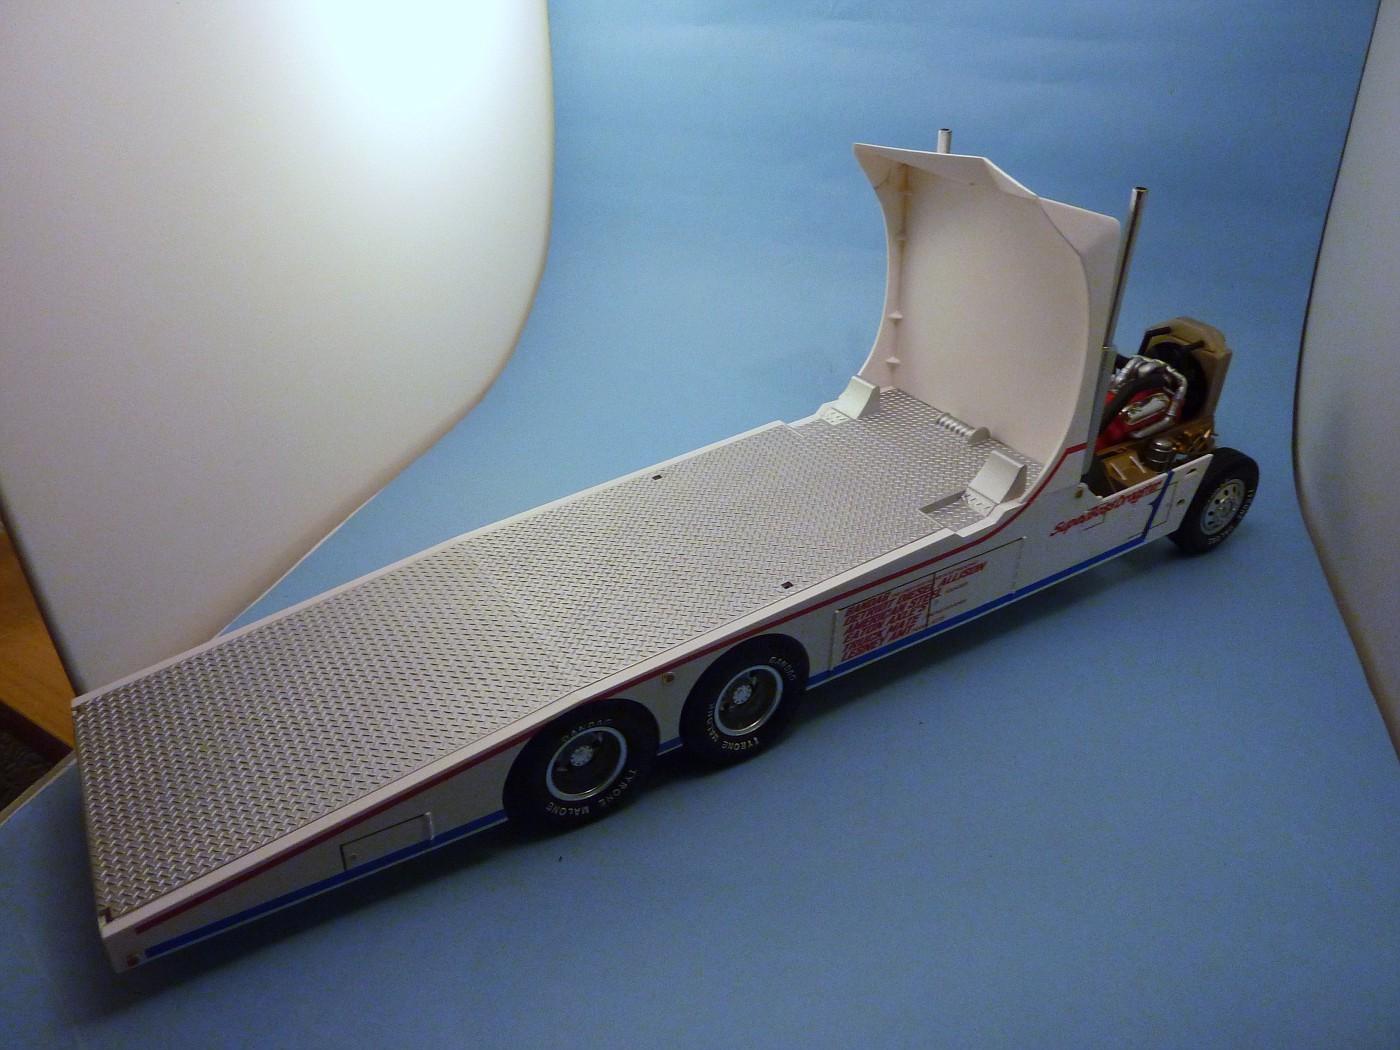 Papa Truck Tyrone Malone terminé  Chassispapatuck008-vi